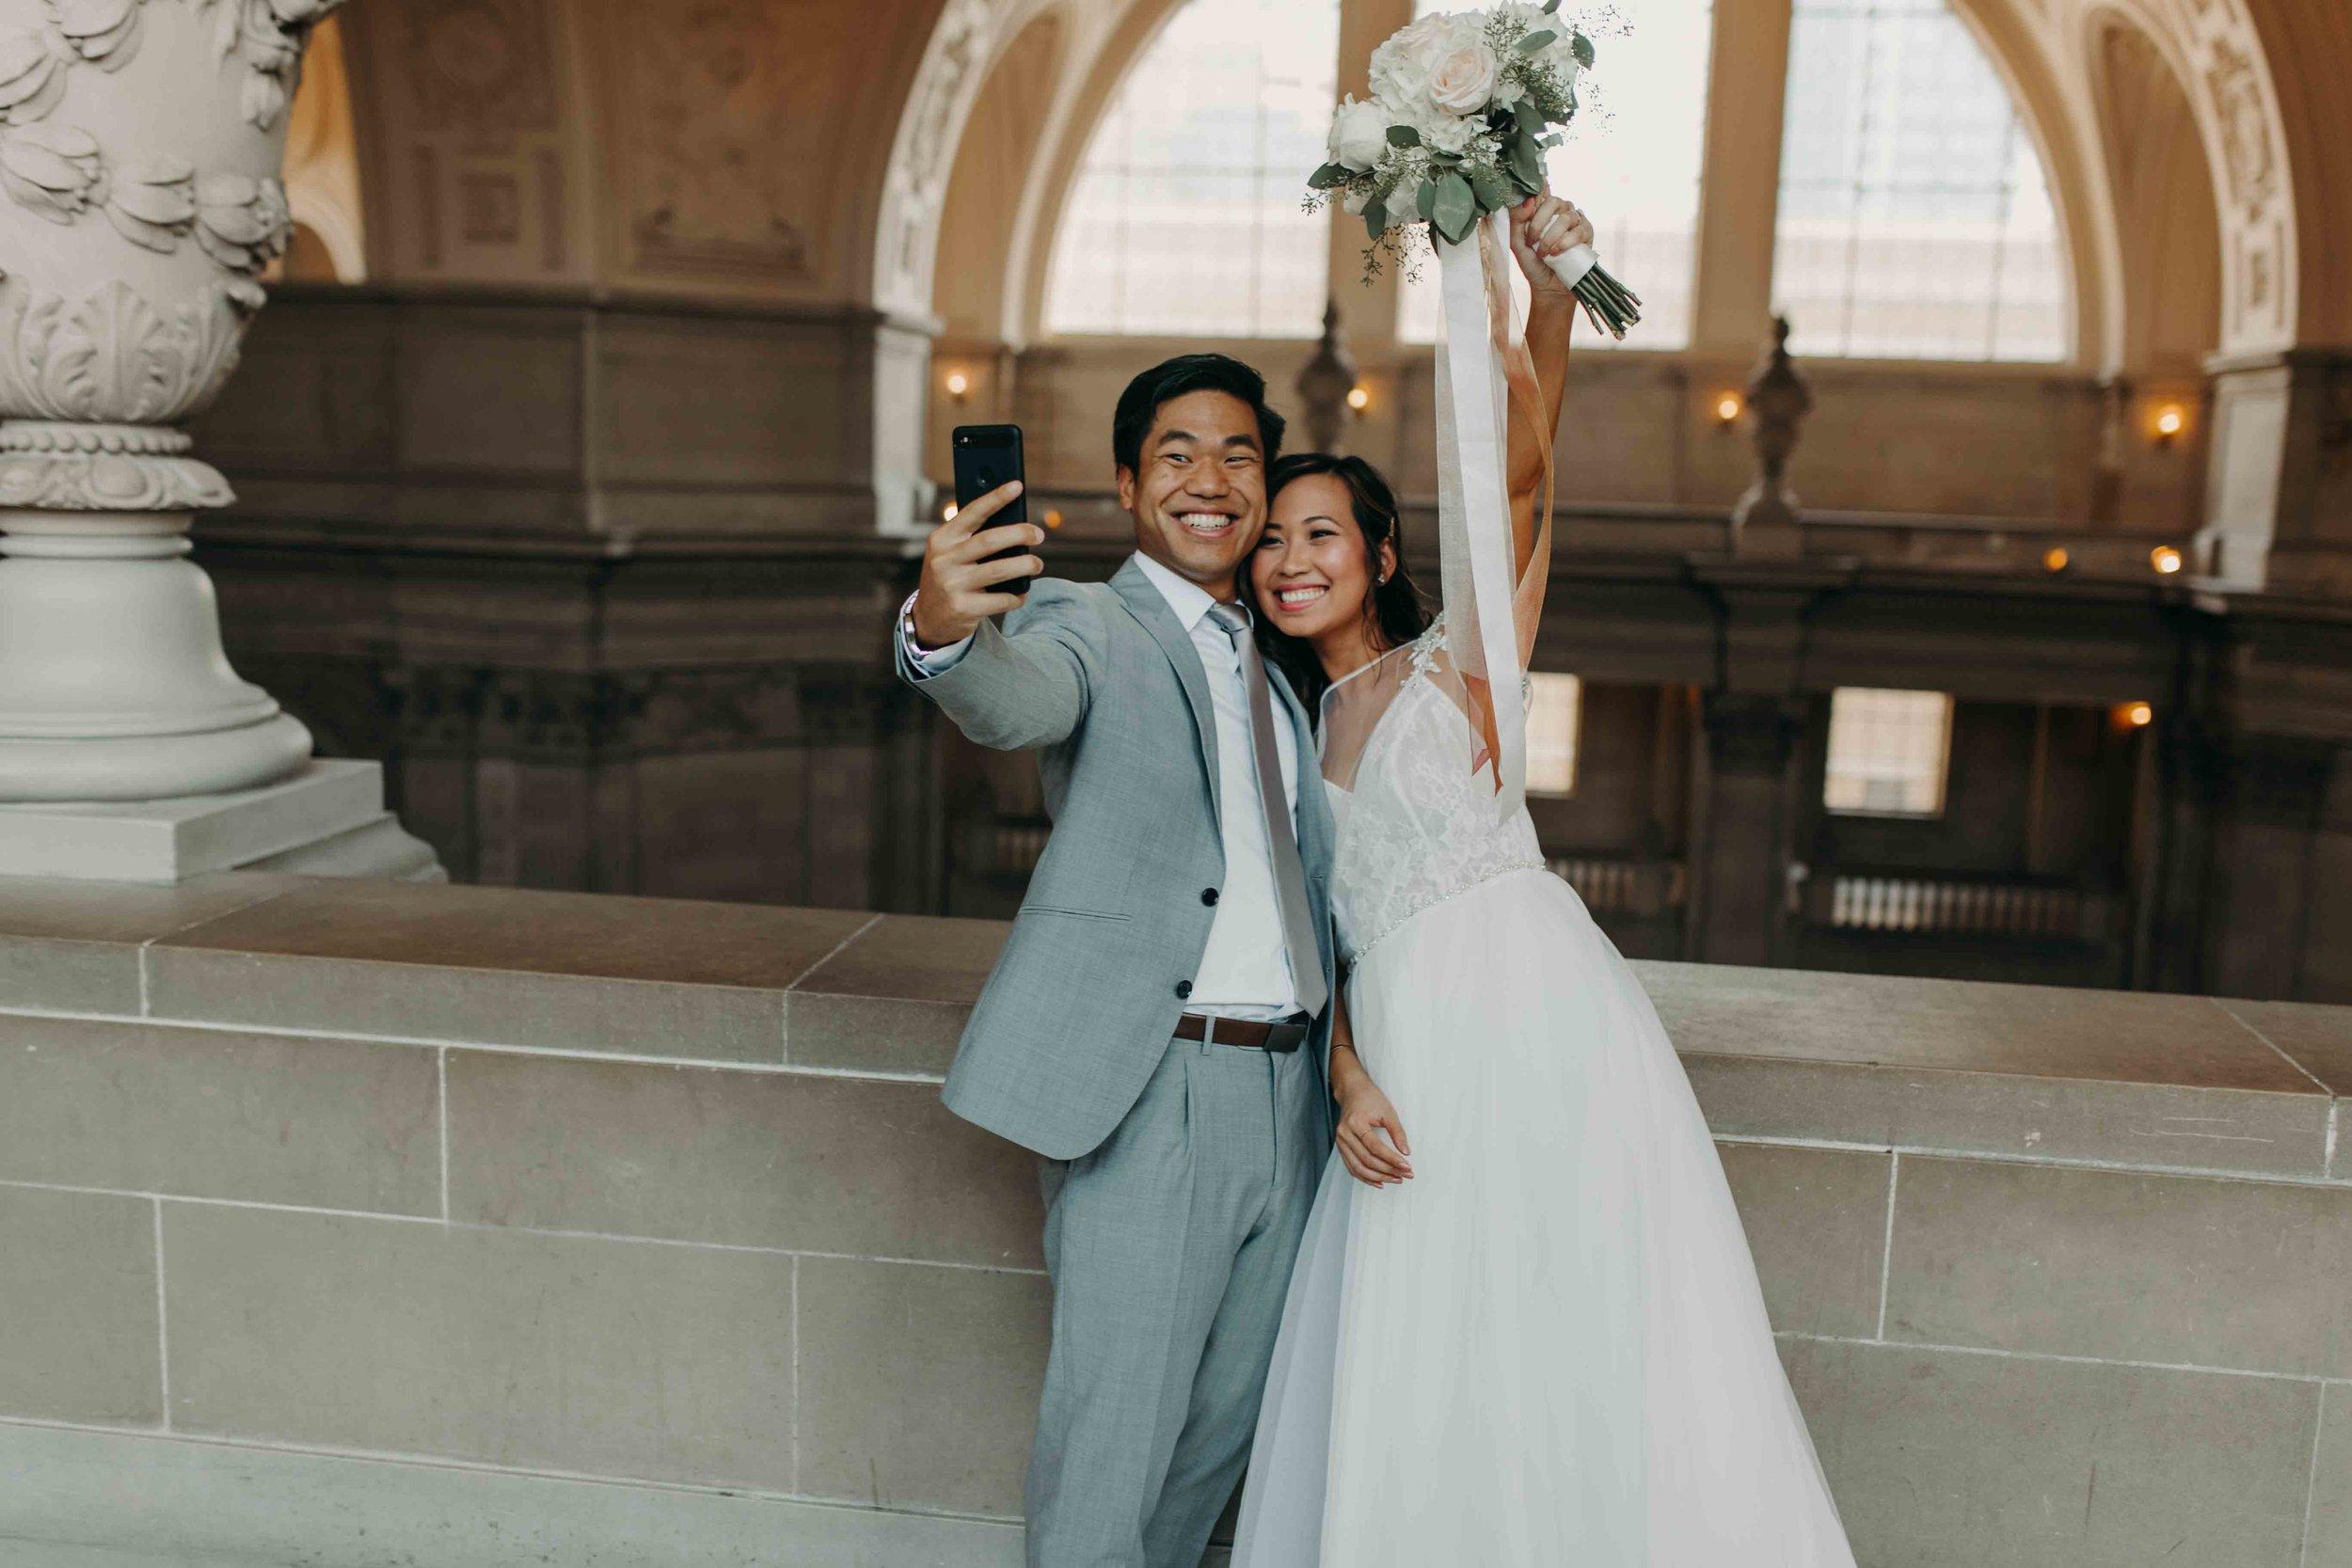 weddingday (27 of 67).jpg